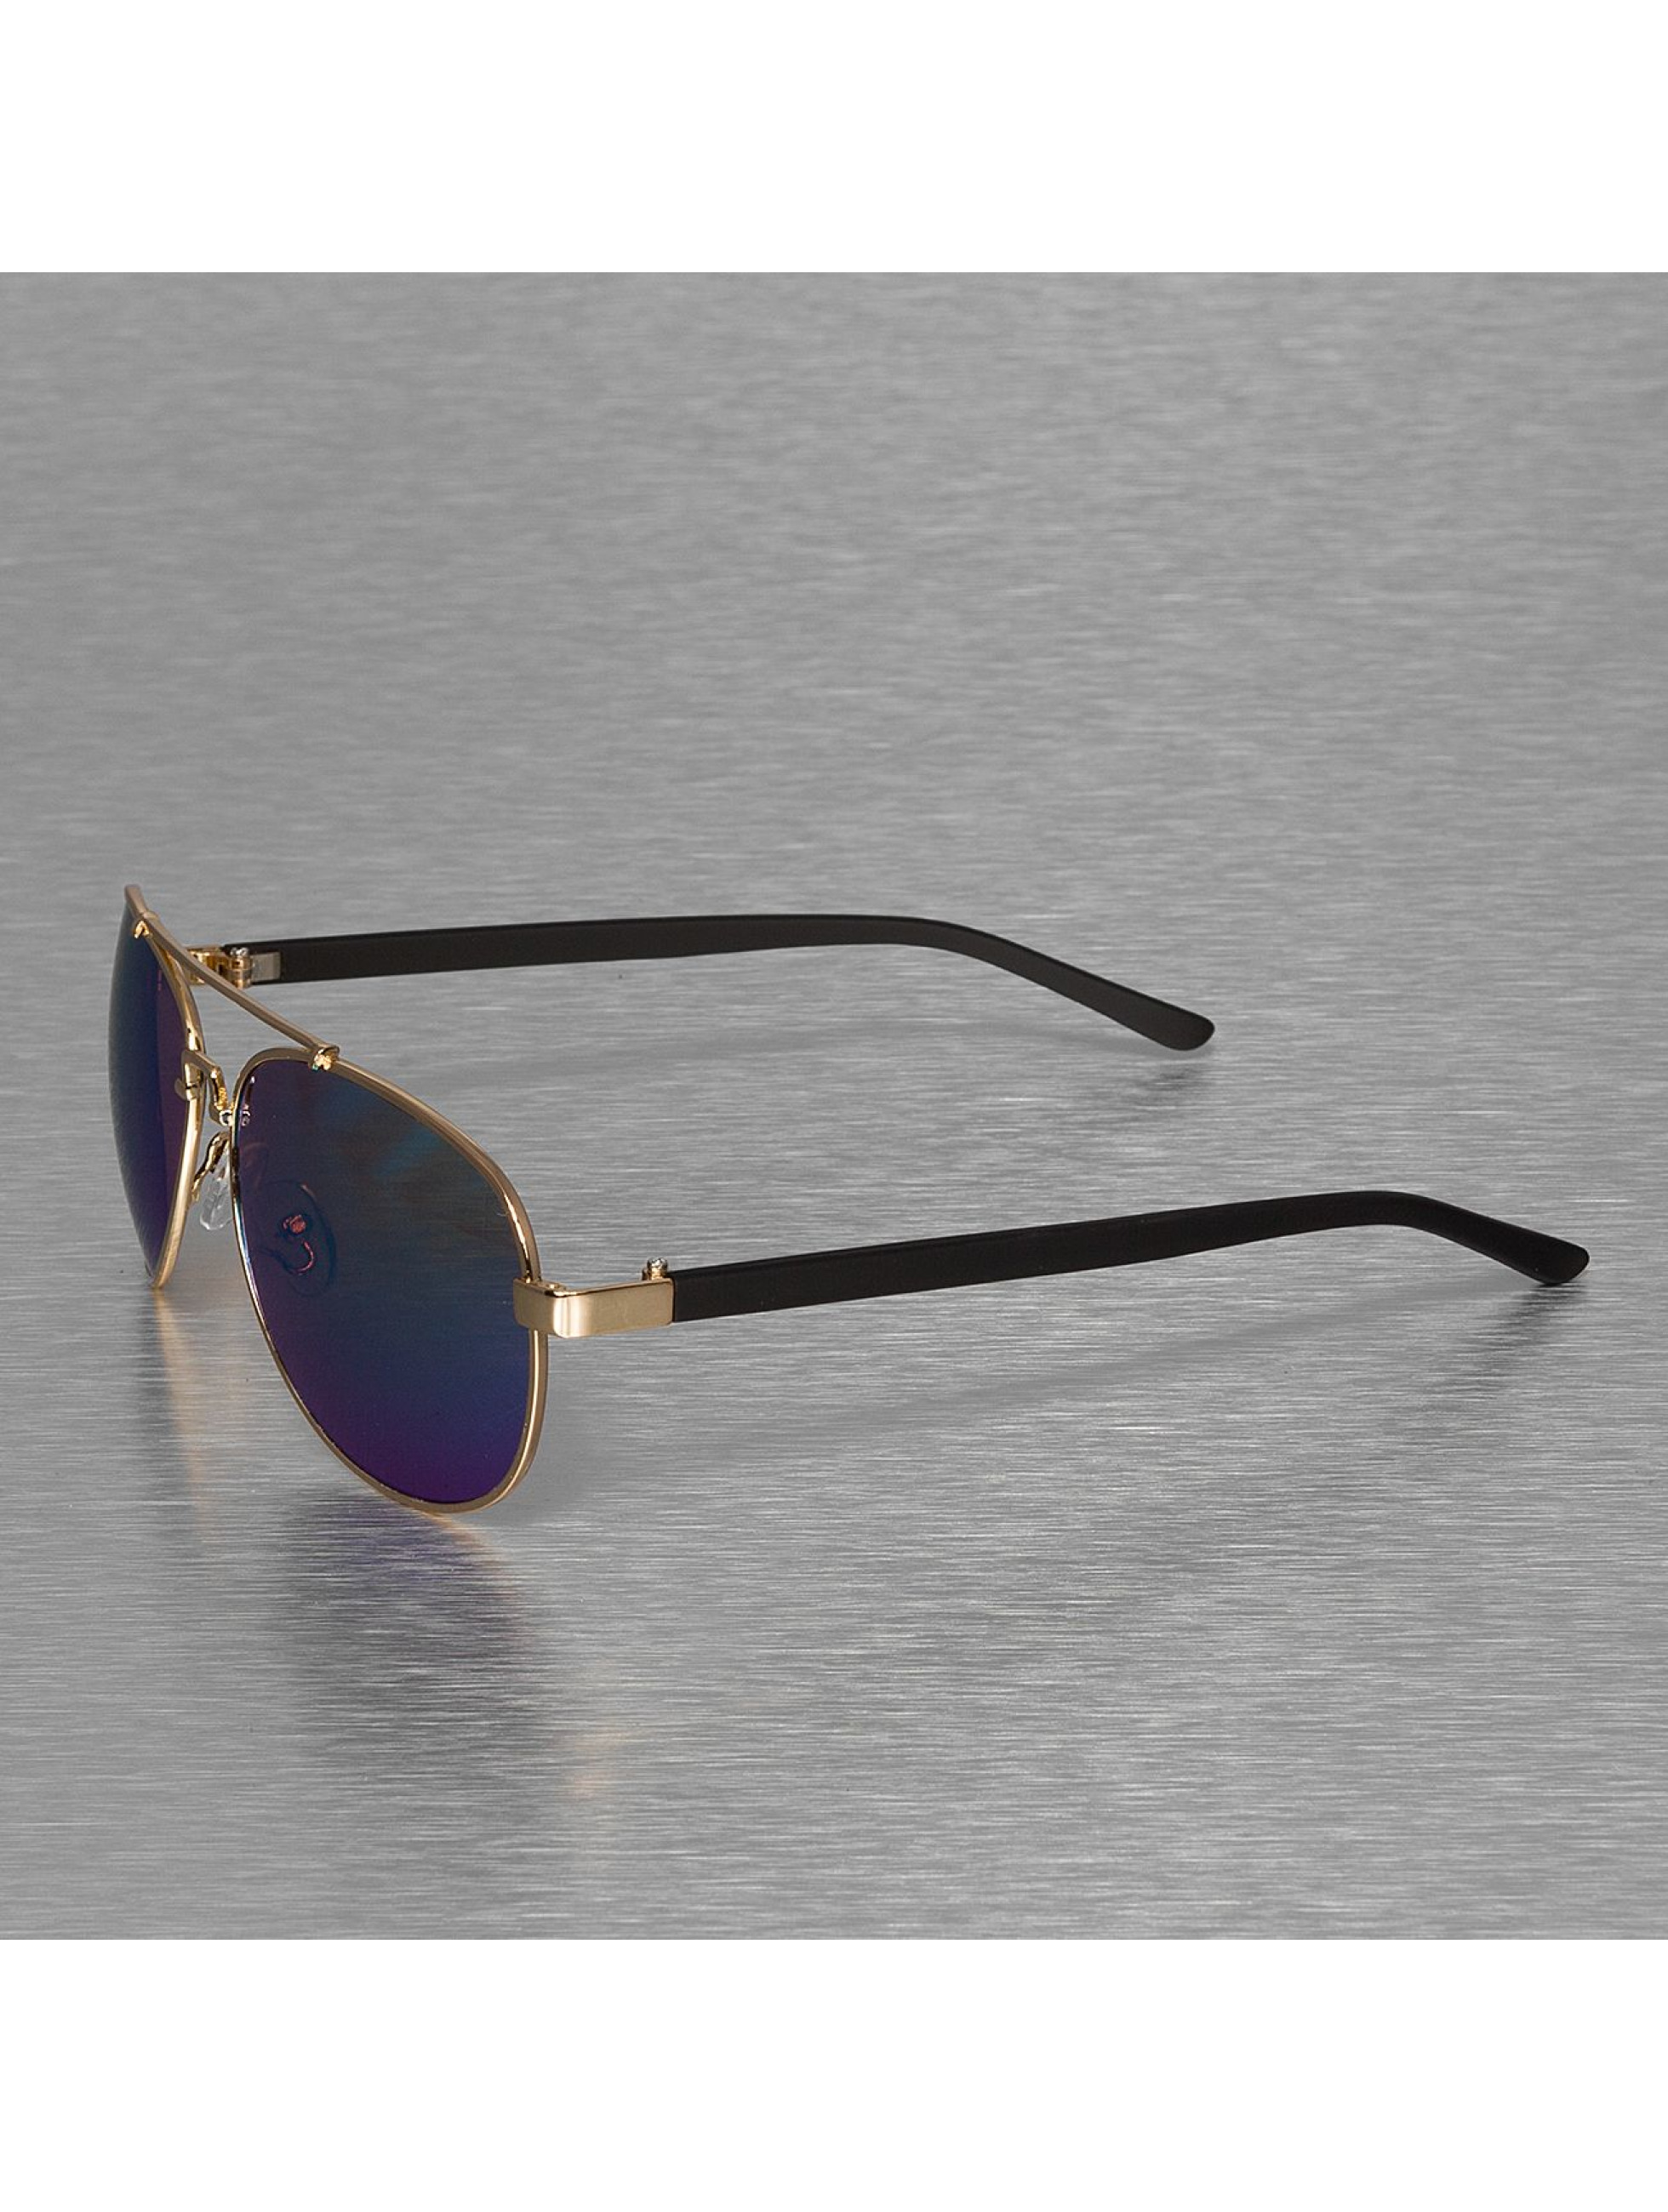 Masterdis Sunglasses Mumbo Mirror Herren Sonnenbrille Gold Grün 6aJcV